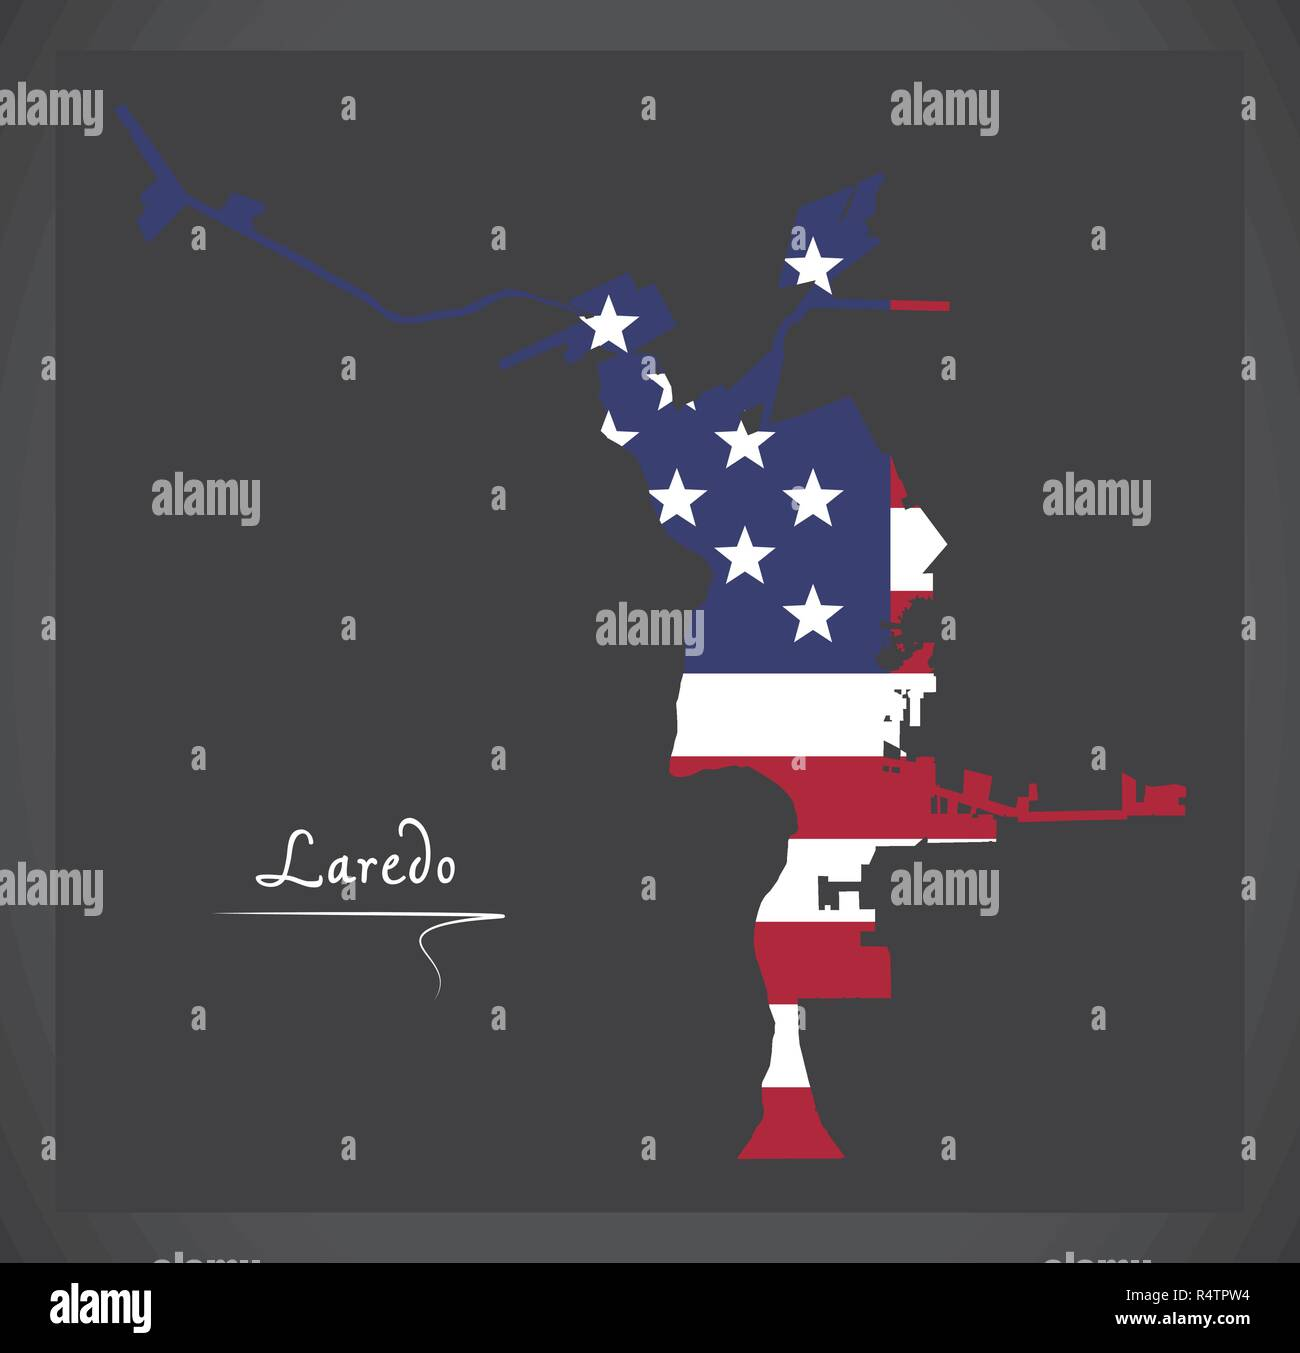 Map Of Texas Showing Laredo.Laredo Texas City Map With American National Flag Illustration Stock